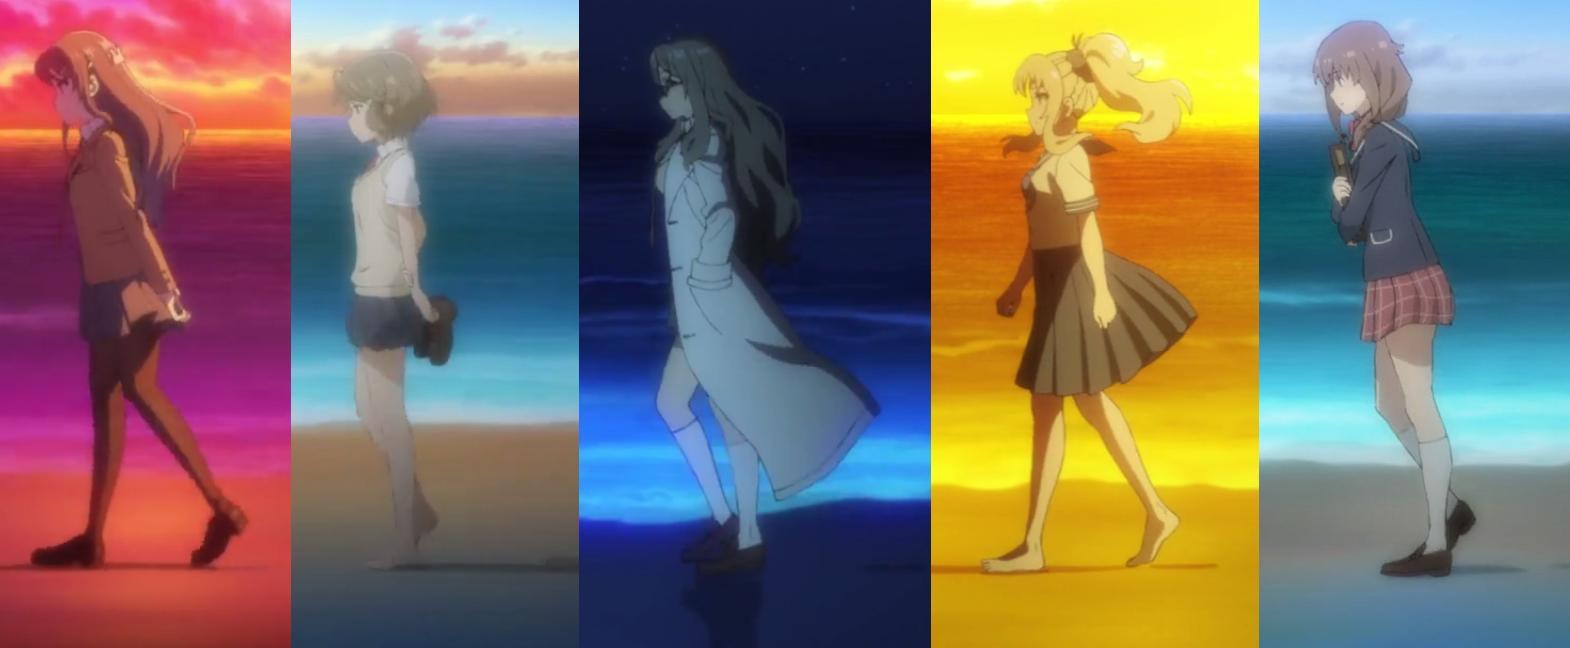 Bunny Girl Senpai: An ED War: Anime Essay